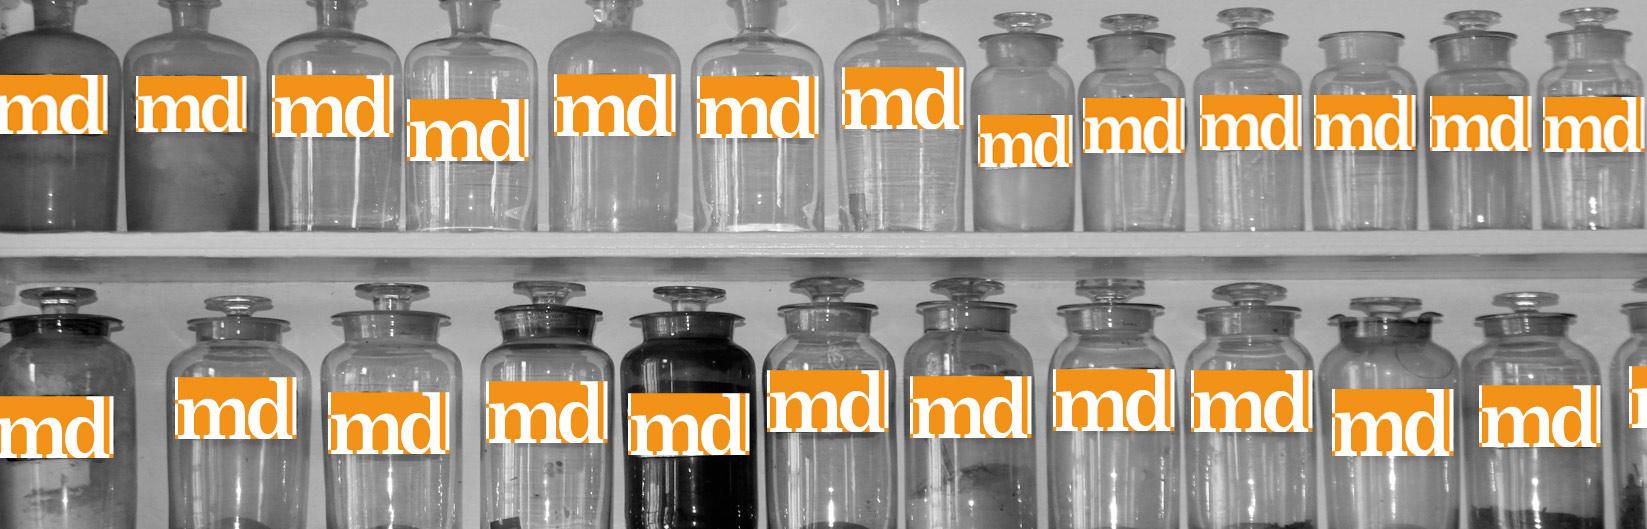 MIDDLETON DAVIES GRAPHIC DESIGN HEADER IMAGE